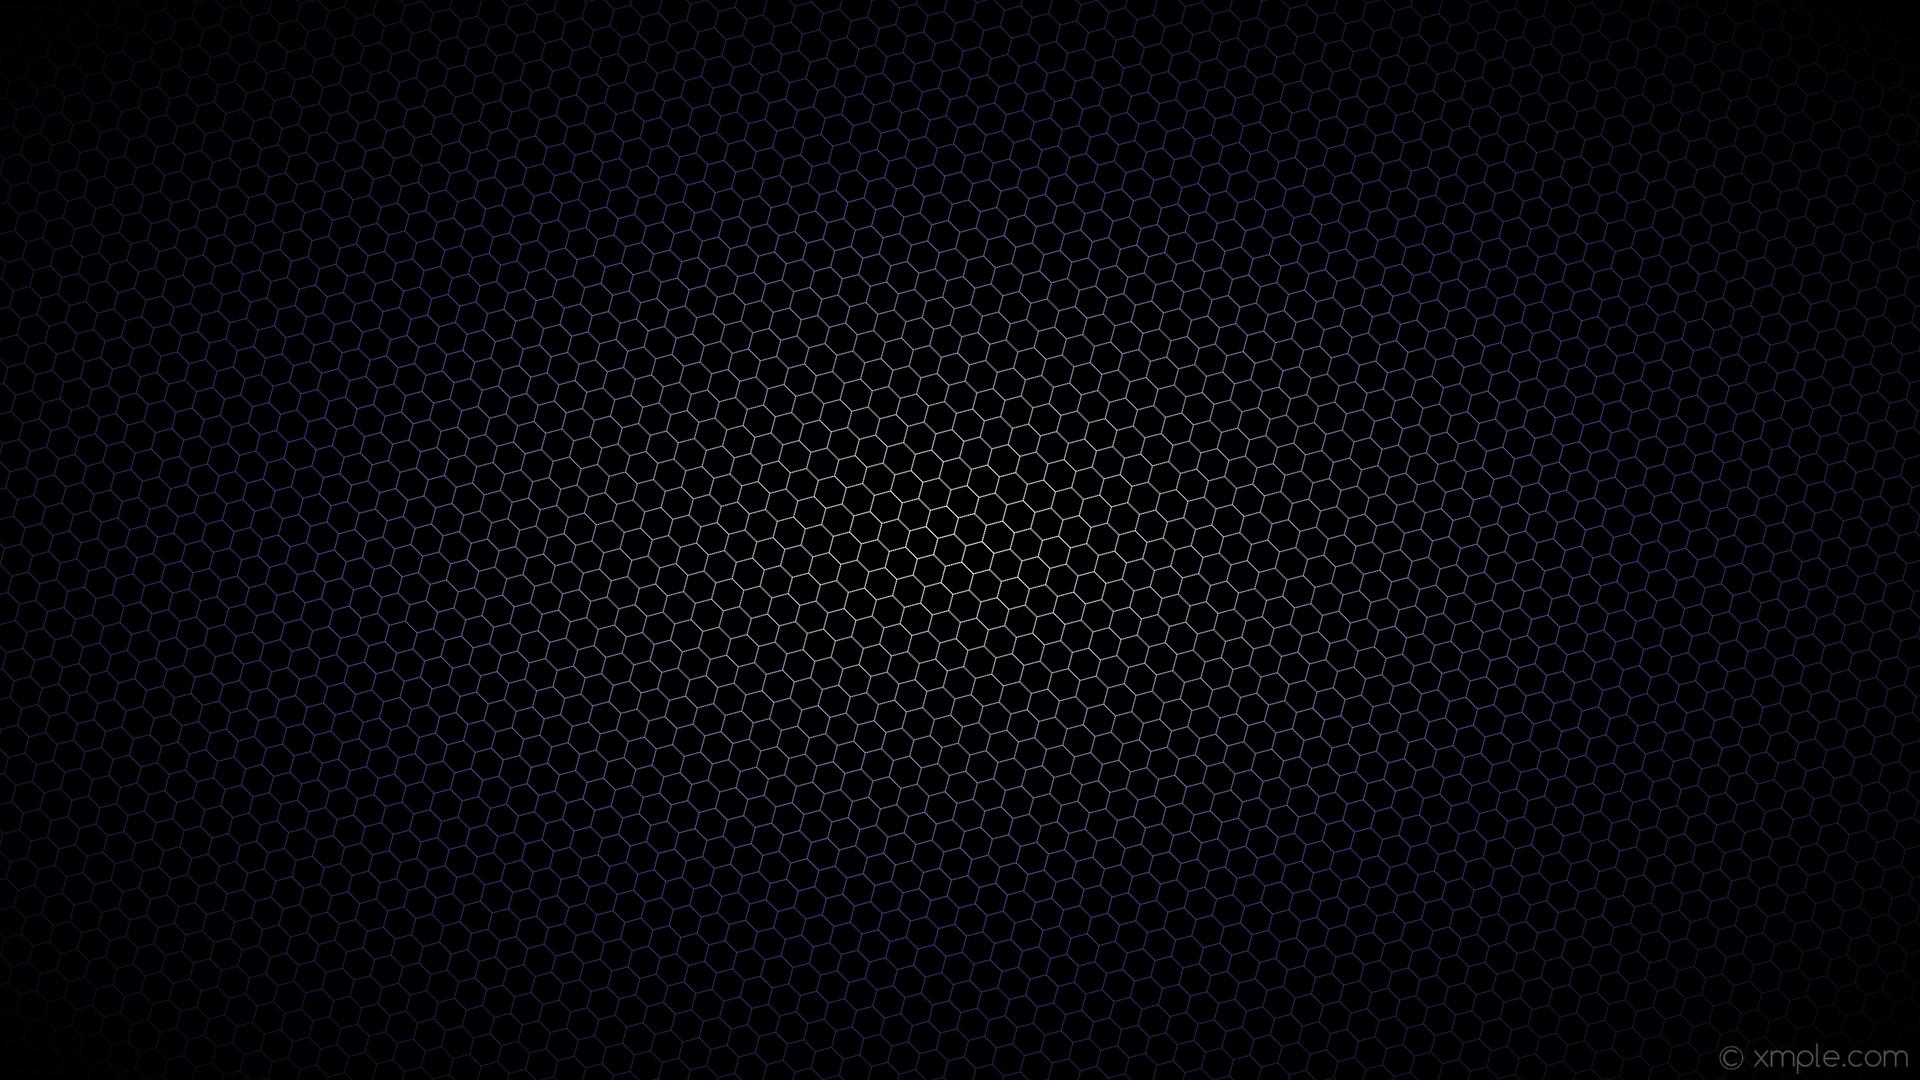 Black Gradient Wallpaper 77 Images